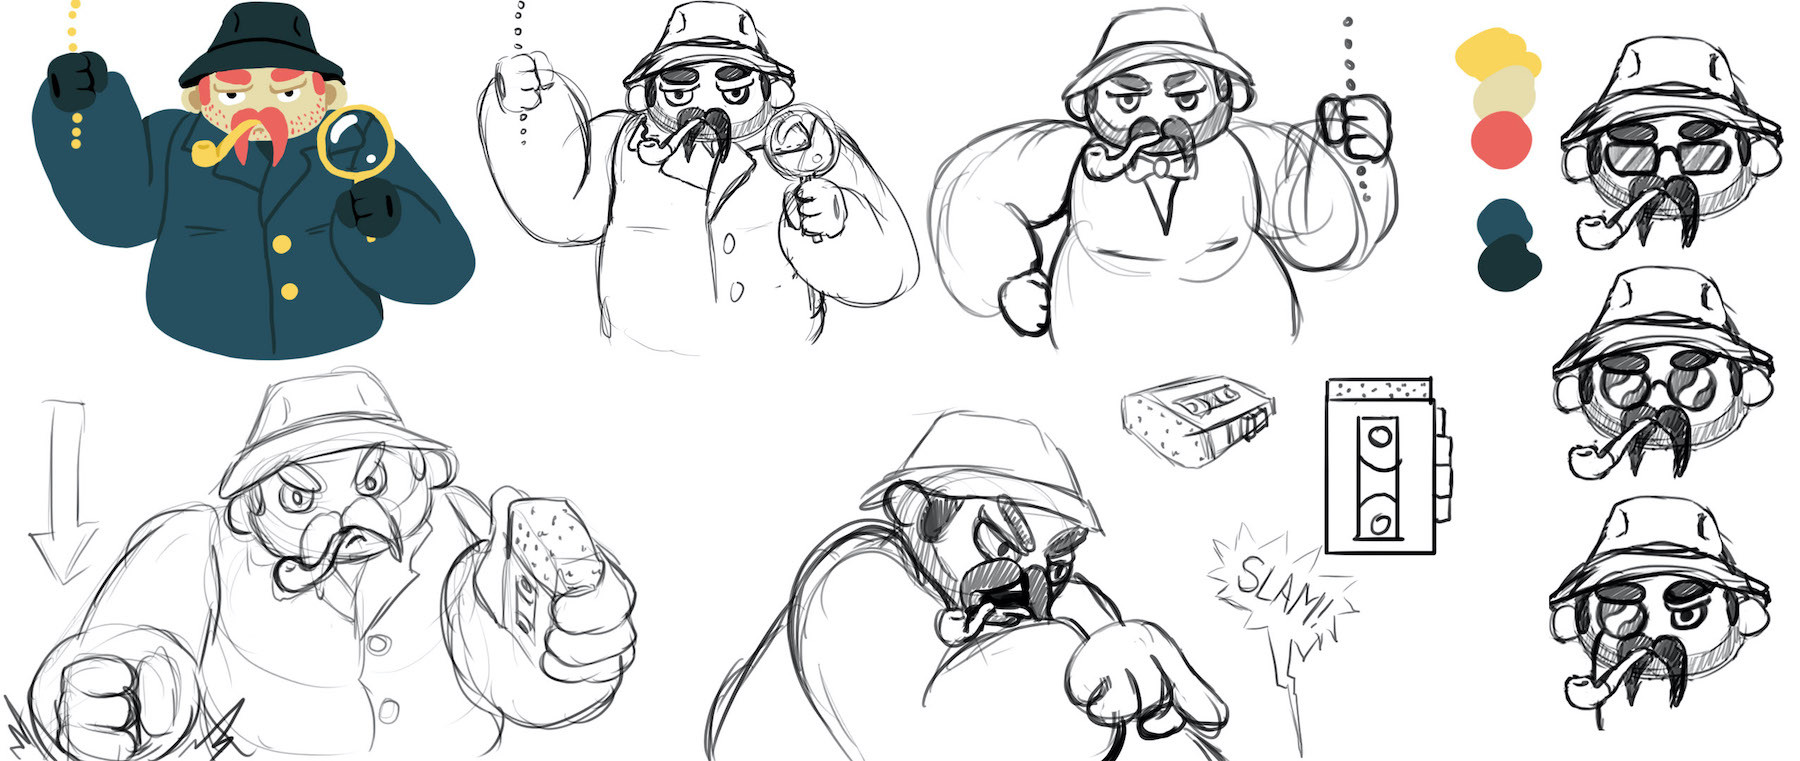 Detective Character Exploration